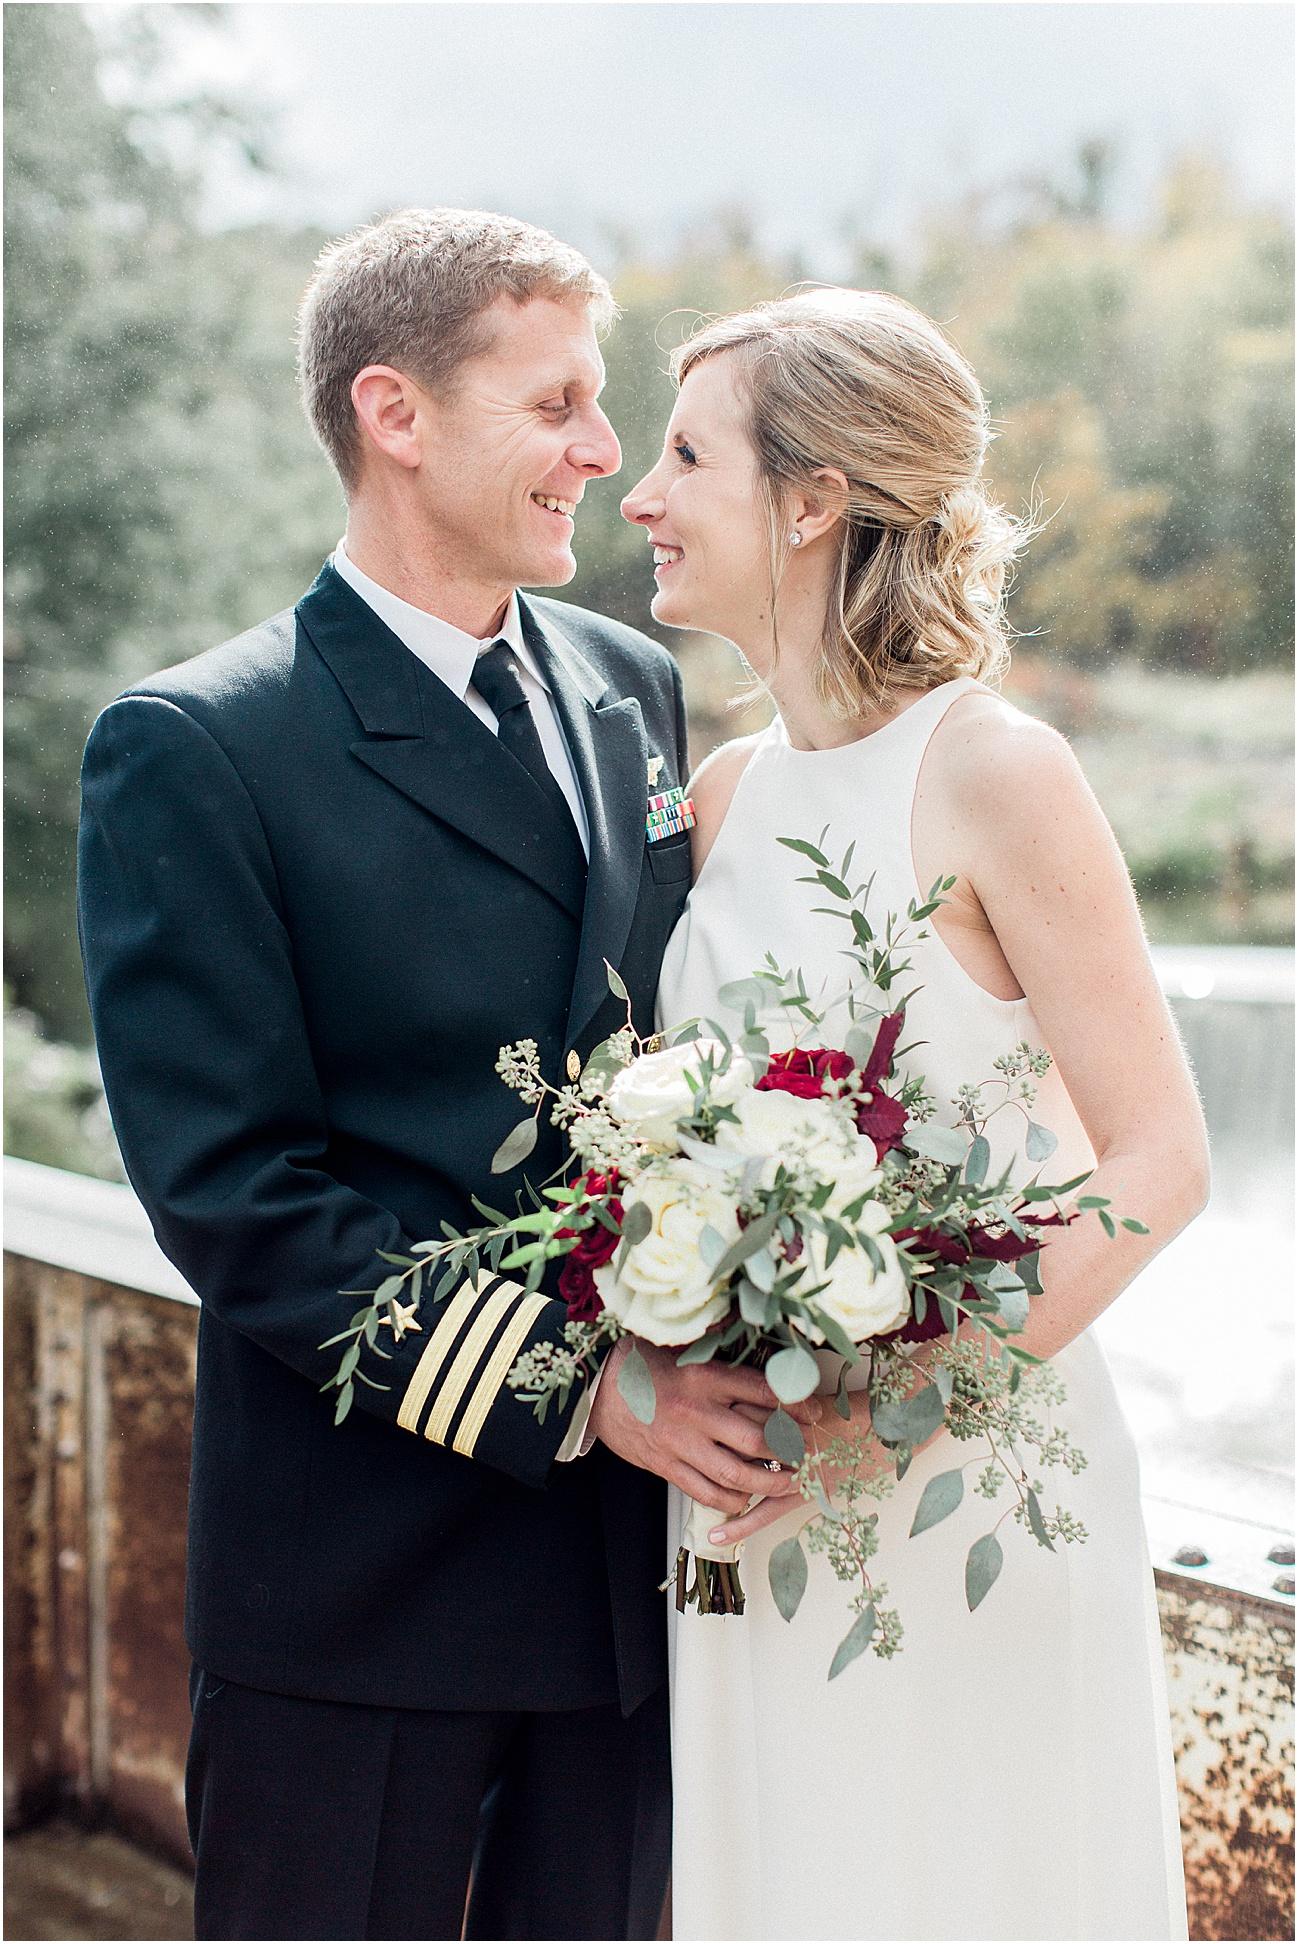 lauren_john_jon_ablany_browns_brewery_moses_farm_fall_cape_cod_boston_wedding_photographer_meredith_jane_photography_photo_1509.jpg